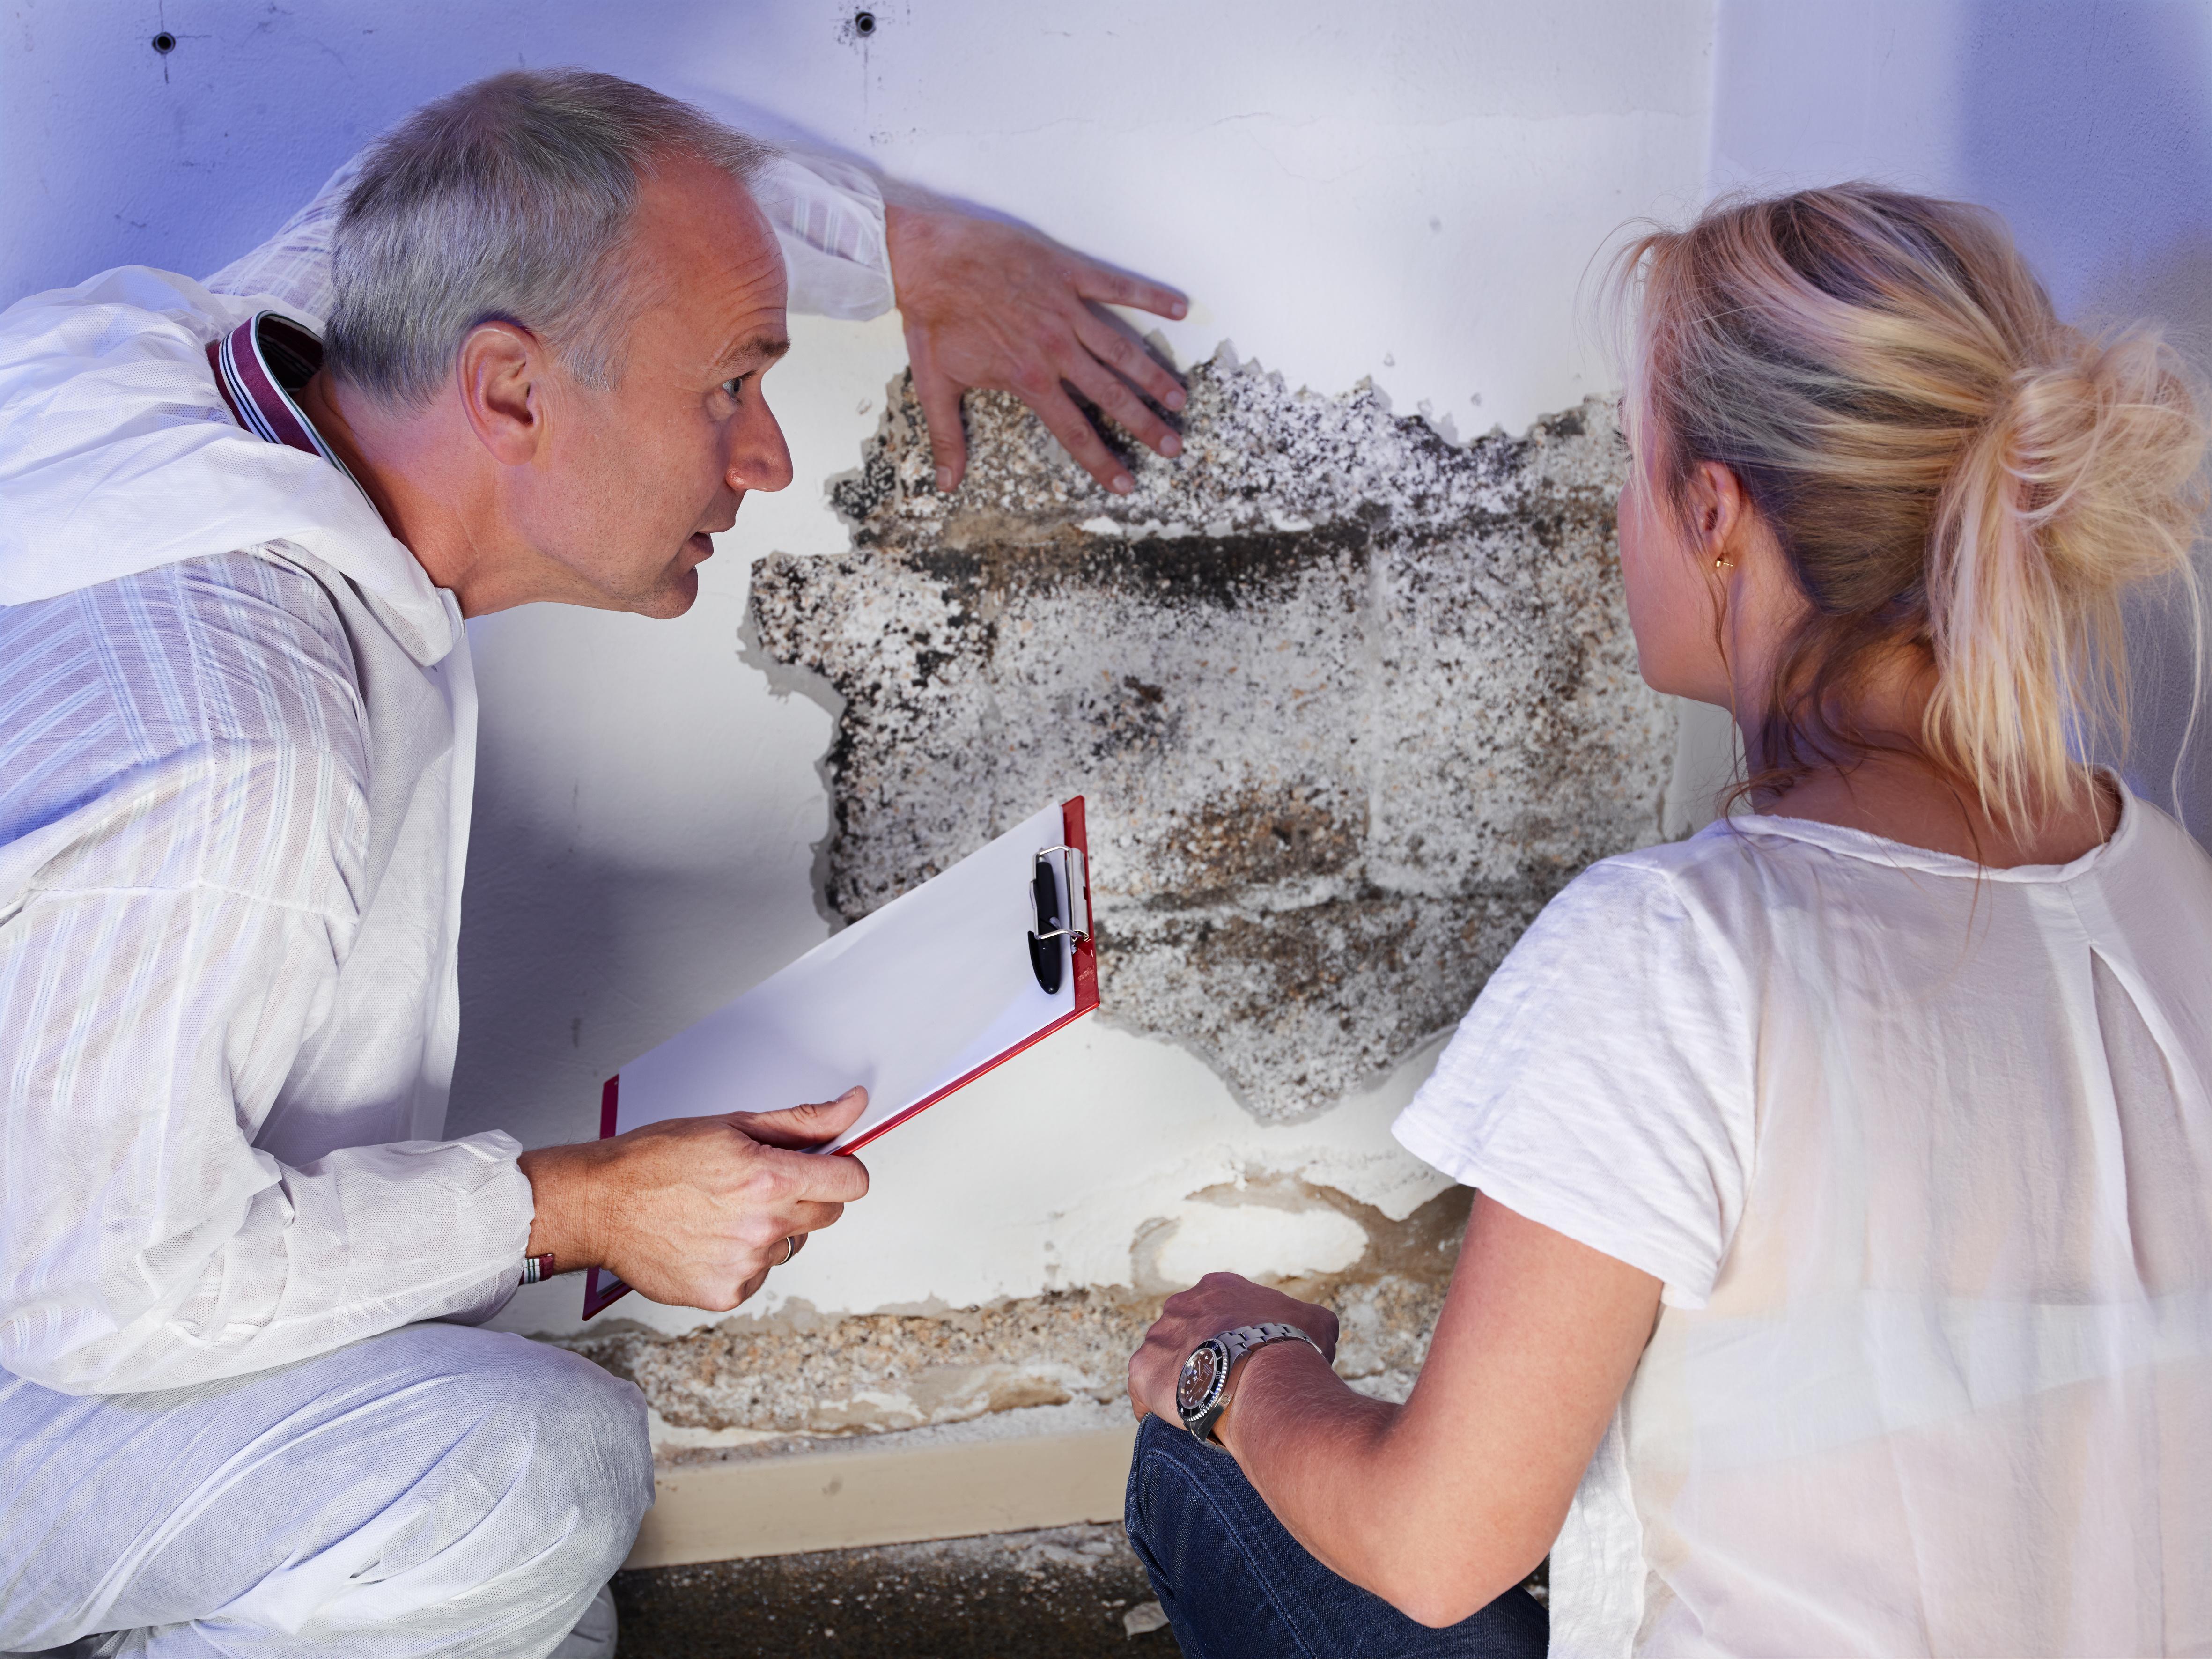 mold inspections nj nj aaa home inspections. Black Bedroom Furniture Sets. Home Design Ideas